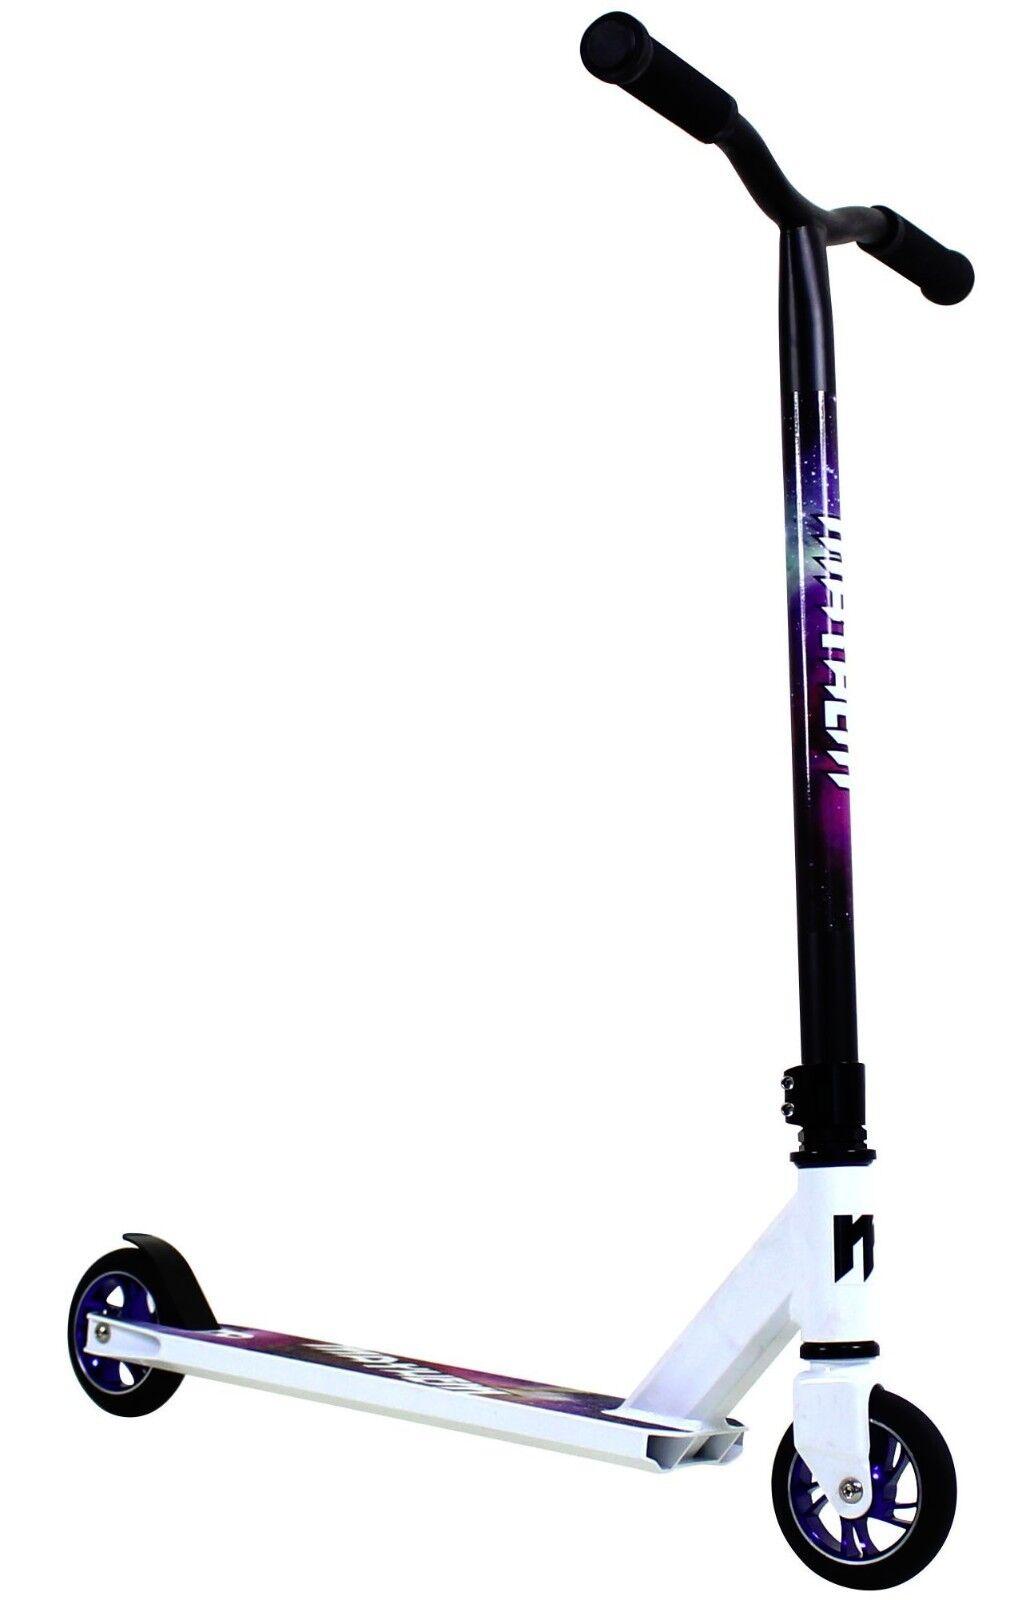 Barra fija Mayhem Galaxy Pro Stunt Kick Scooter blancoo Nuevo Envío Mismo Día